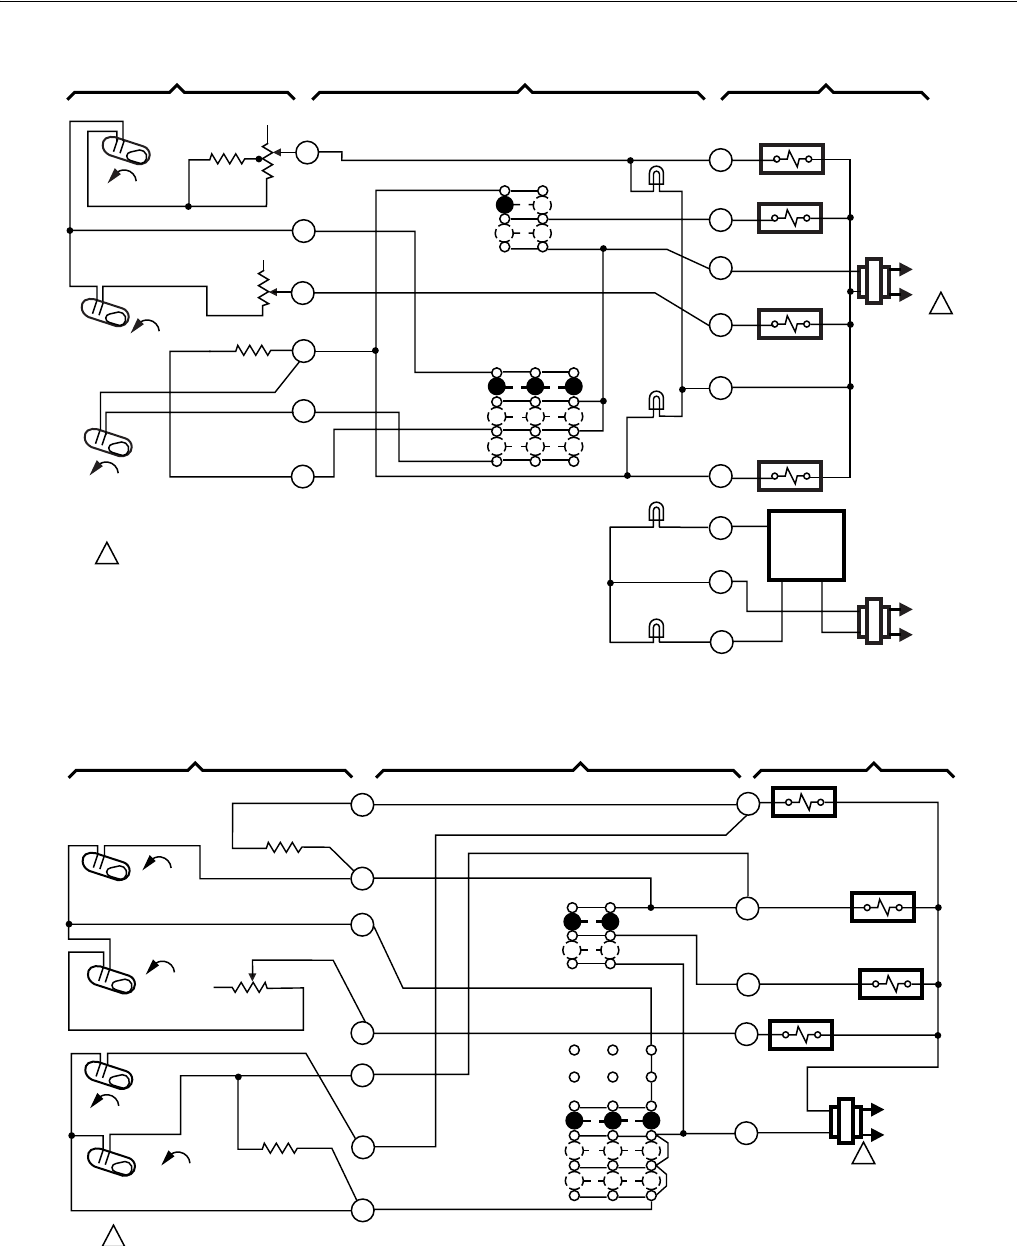 simplefort 2200 thermostat wiring diagram